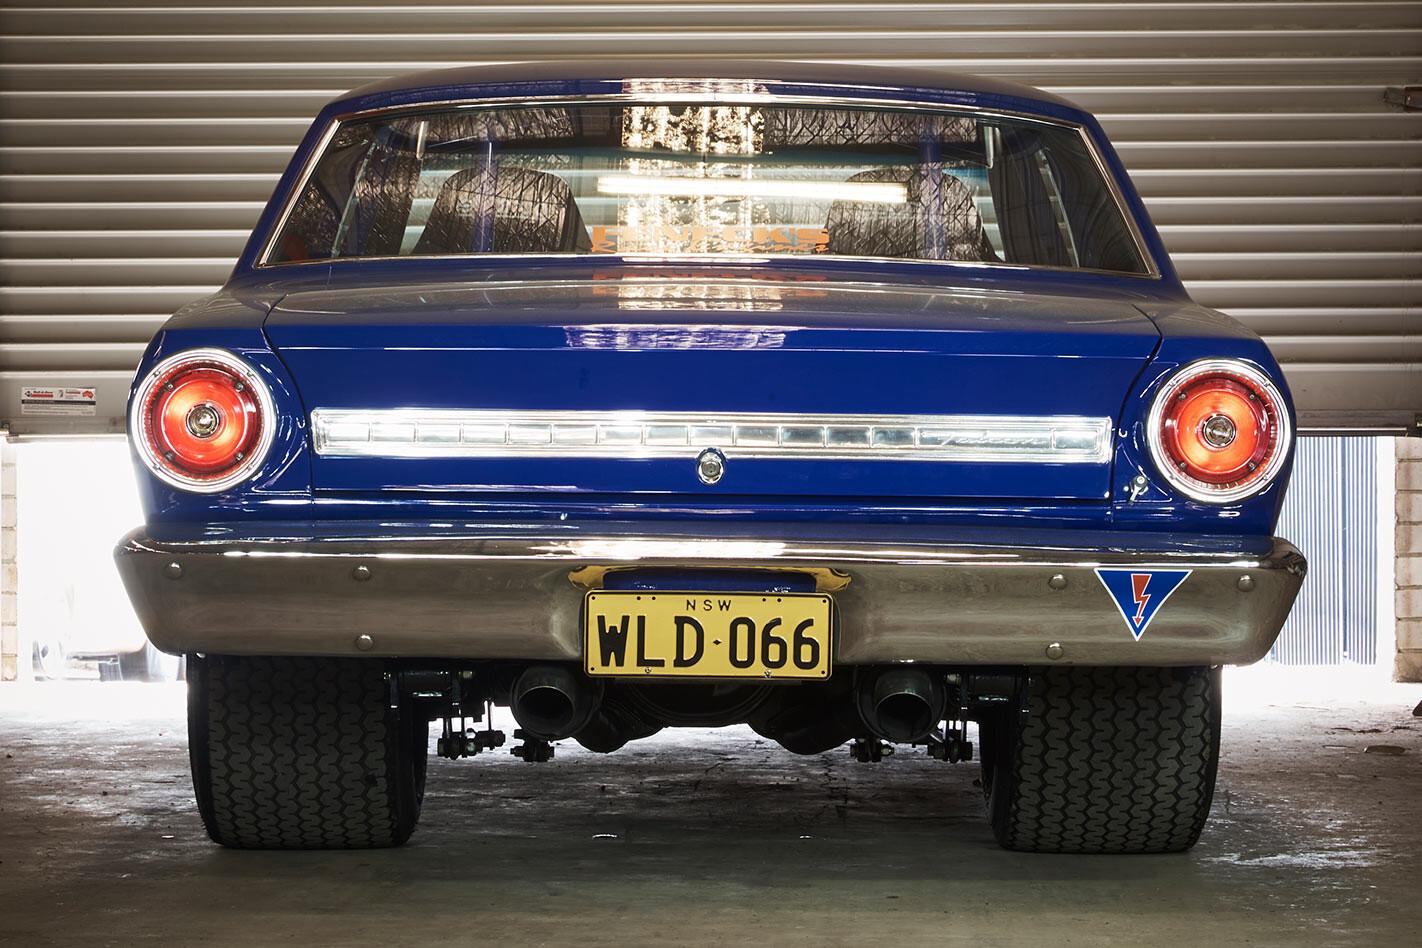 Ford Futura sports coupe rear